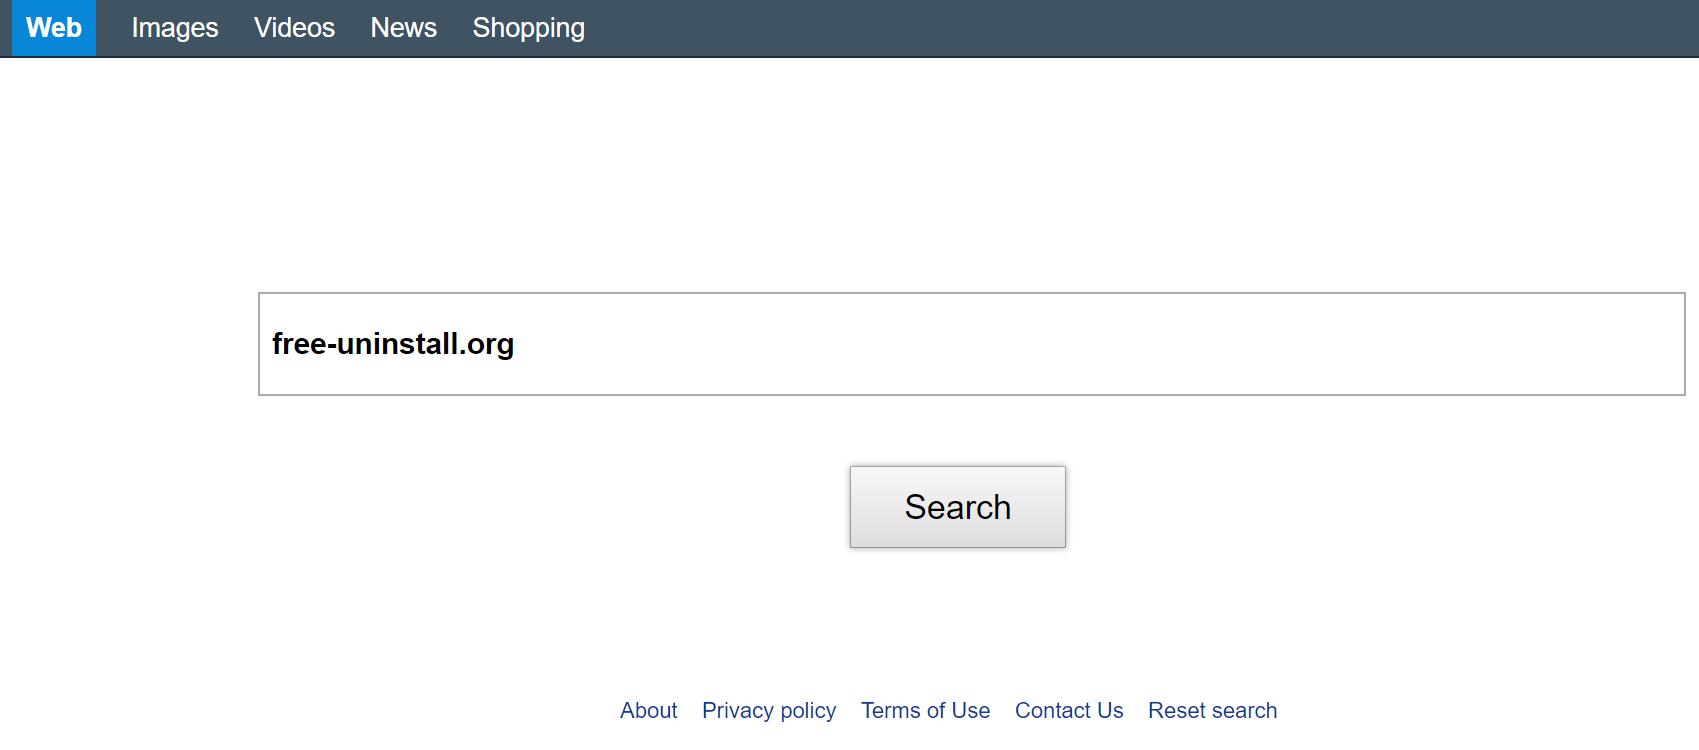 Search.ishimotto.com (Mac) ads